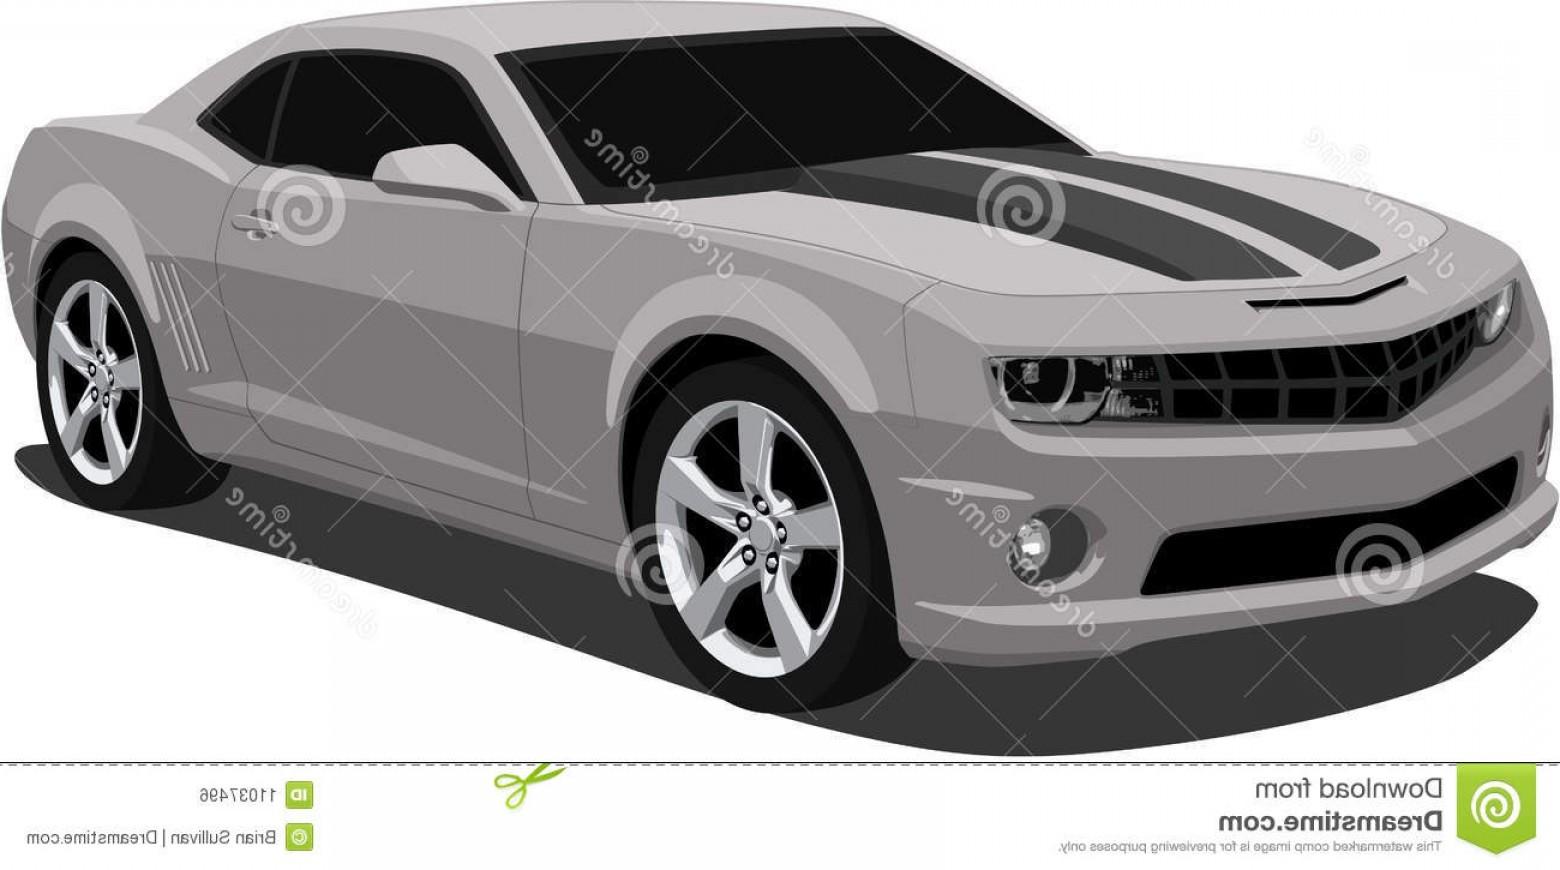 1560x870 Royalty Free Stock Image Vector Camaro Sports Car Image Sohadacouri